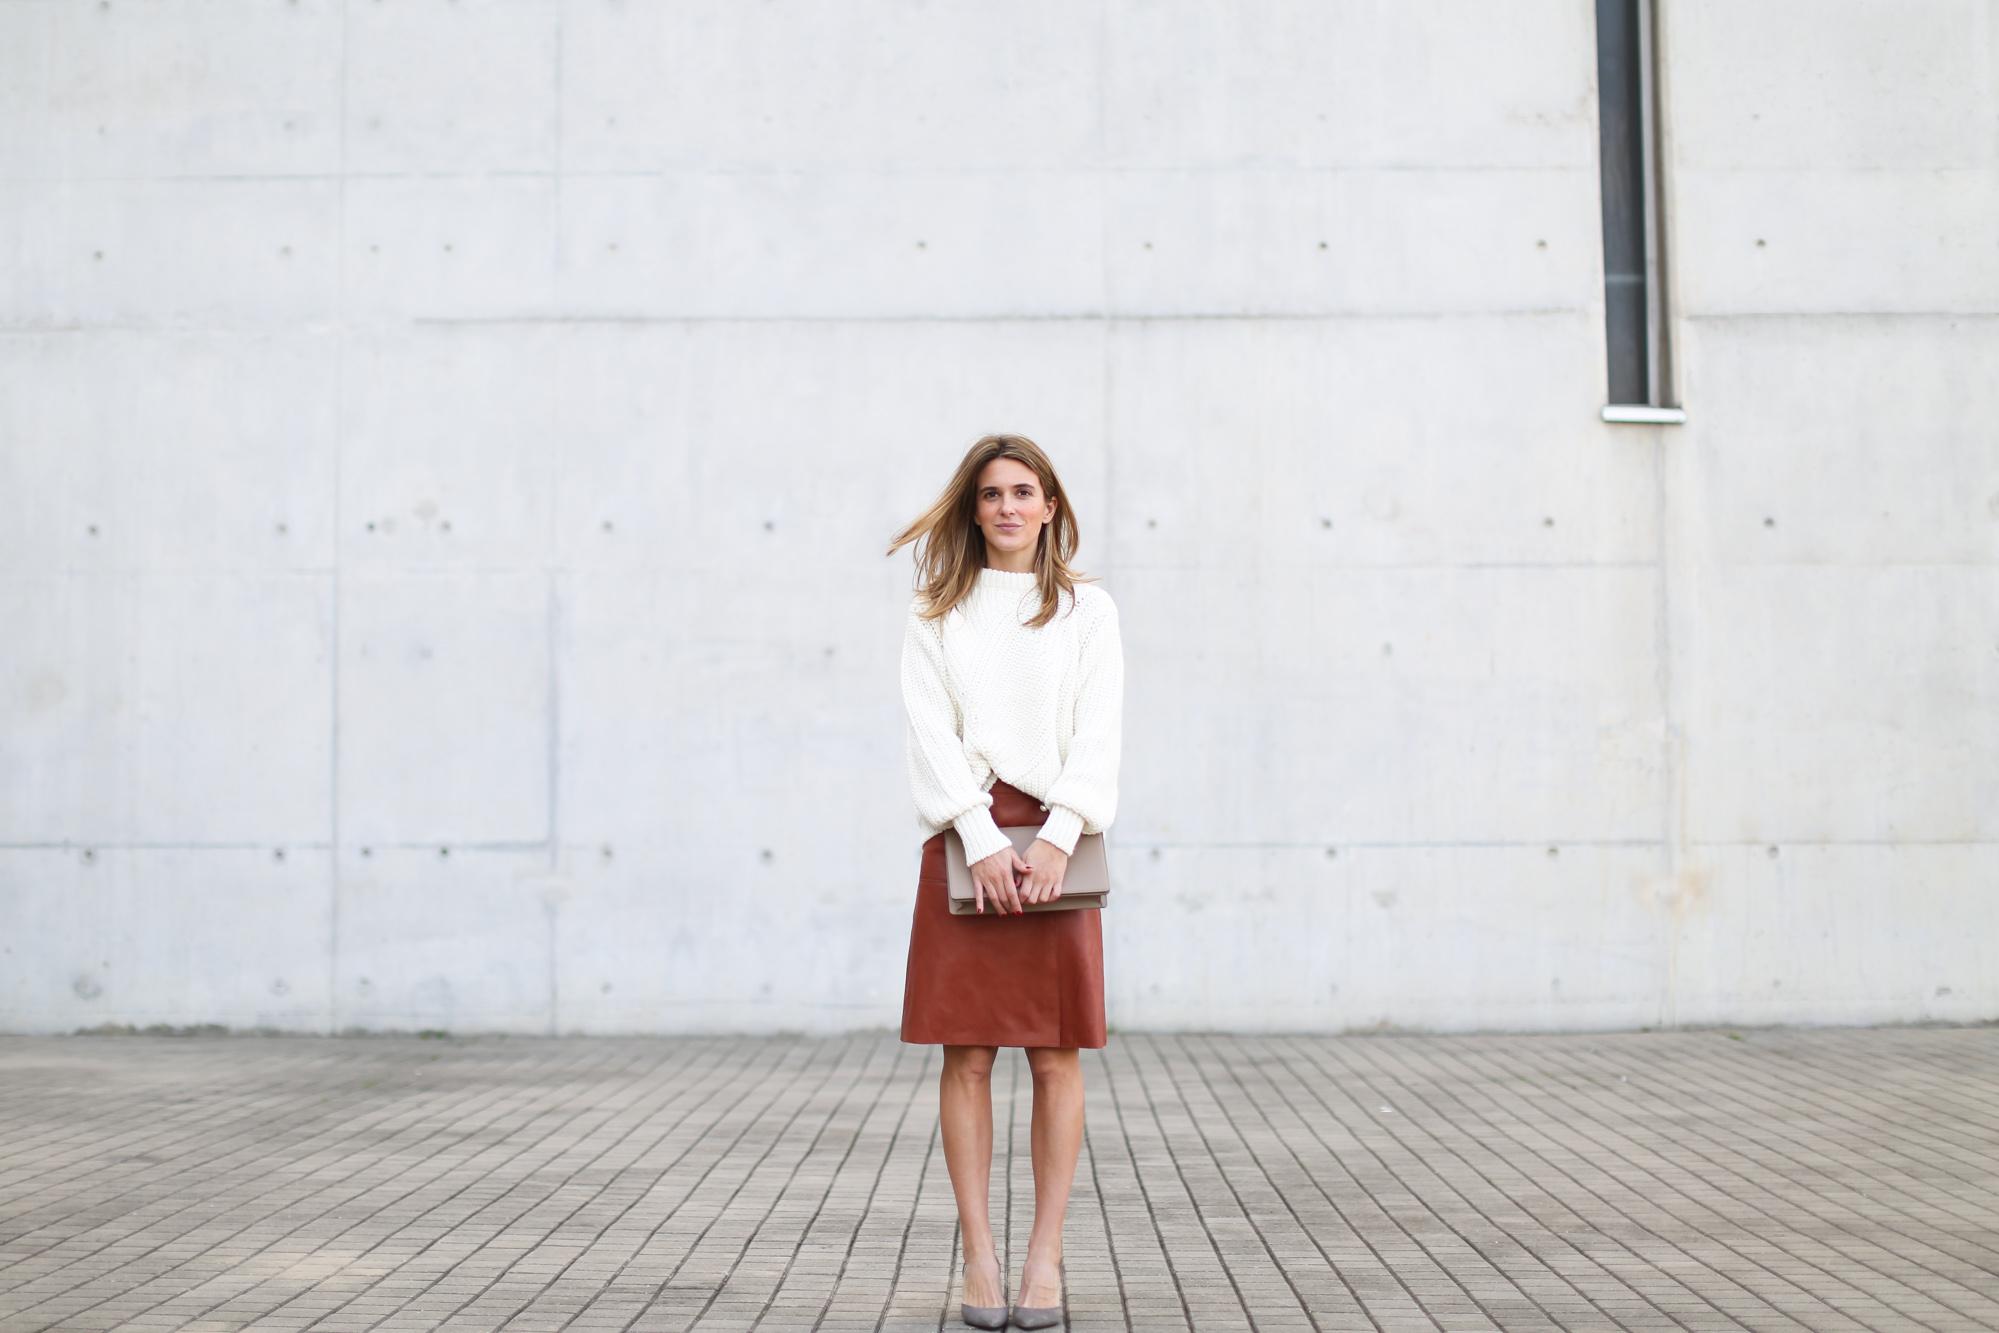 Clochet_streetstyle_steve_mono_leather_bag_trimmerbilbao_filippaK_leatherskirt-4